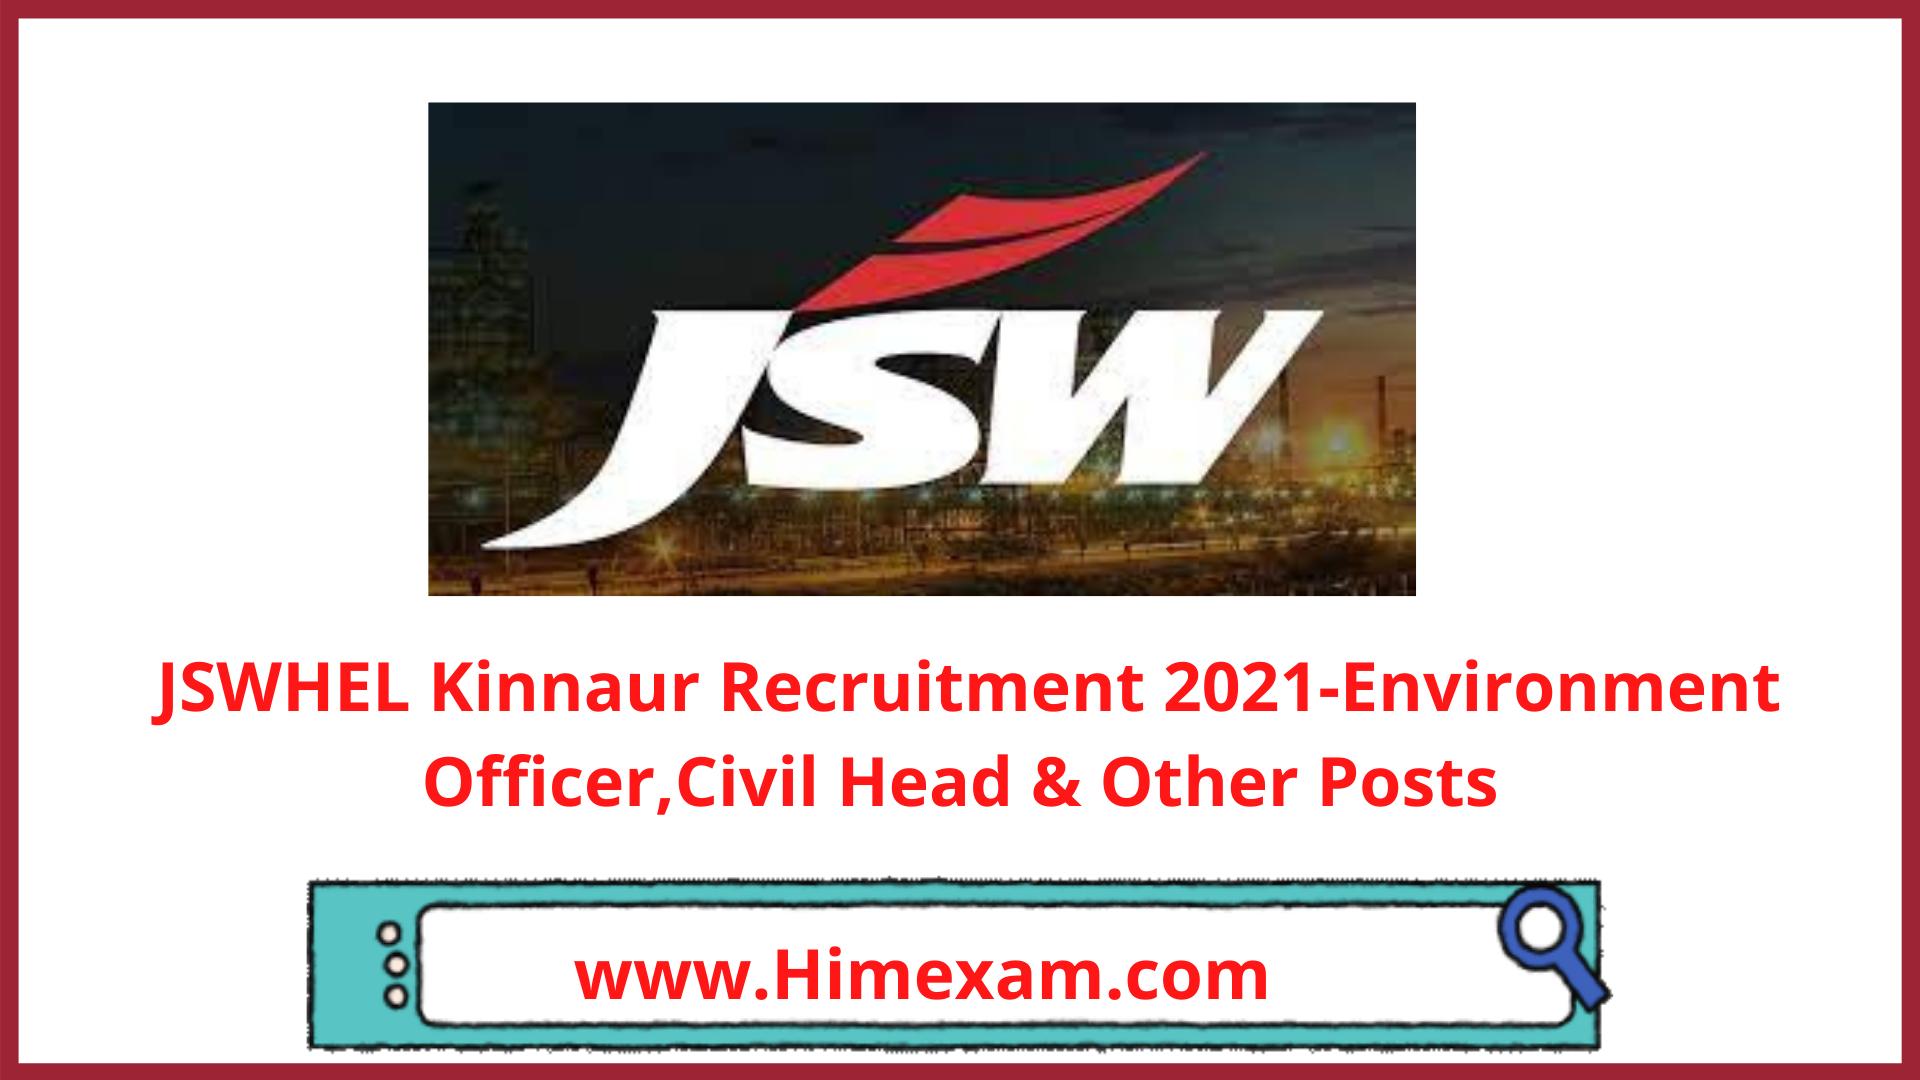 JSWHEL Kinnaur Recruitment 2021-Environment Officer,Civil Head & Other Posts